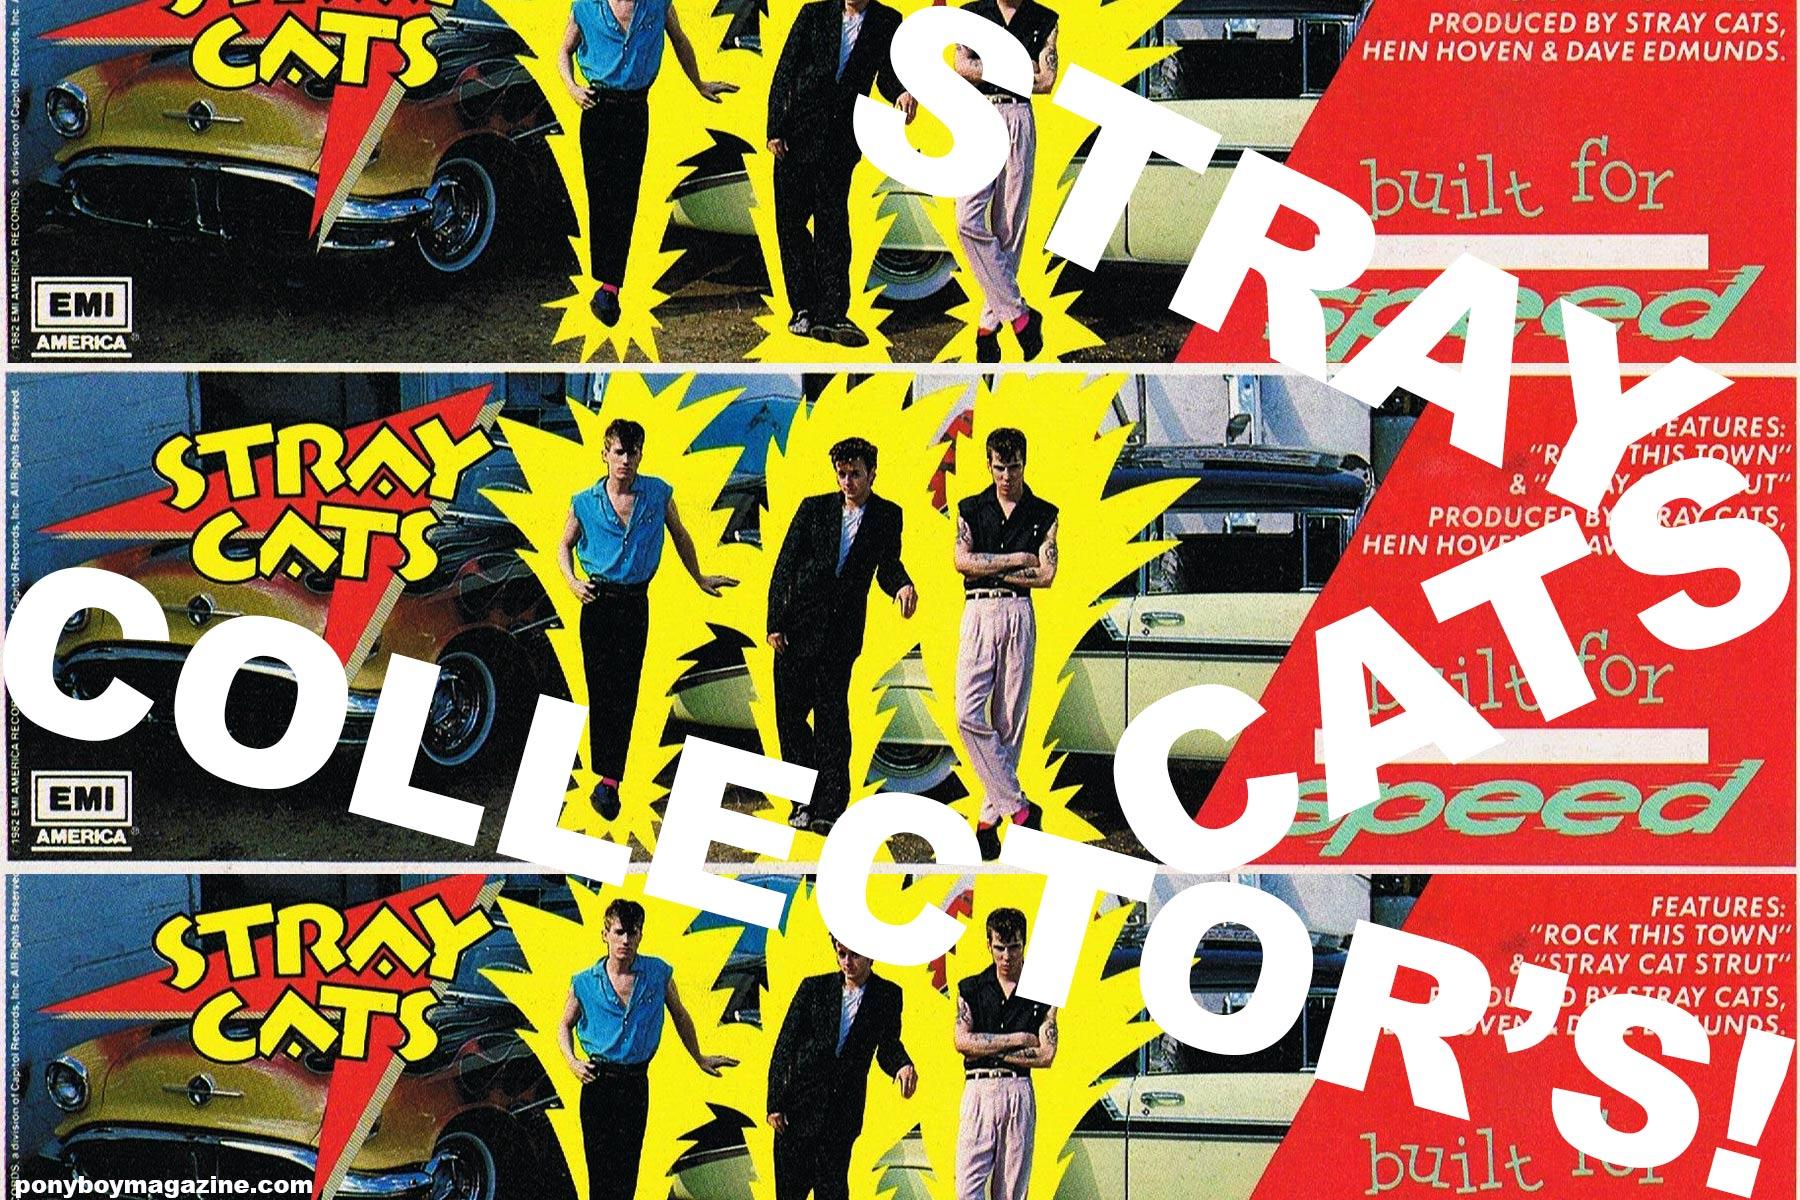 Stray Cat's Collector's. Ponyboy magazine.